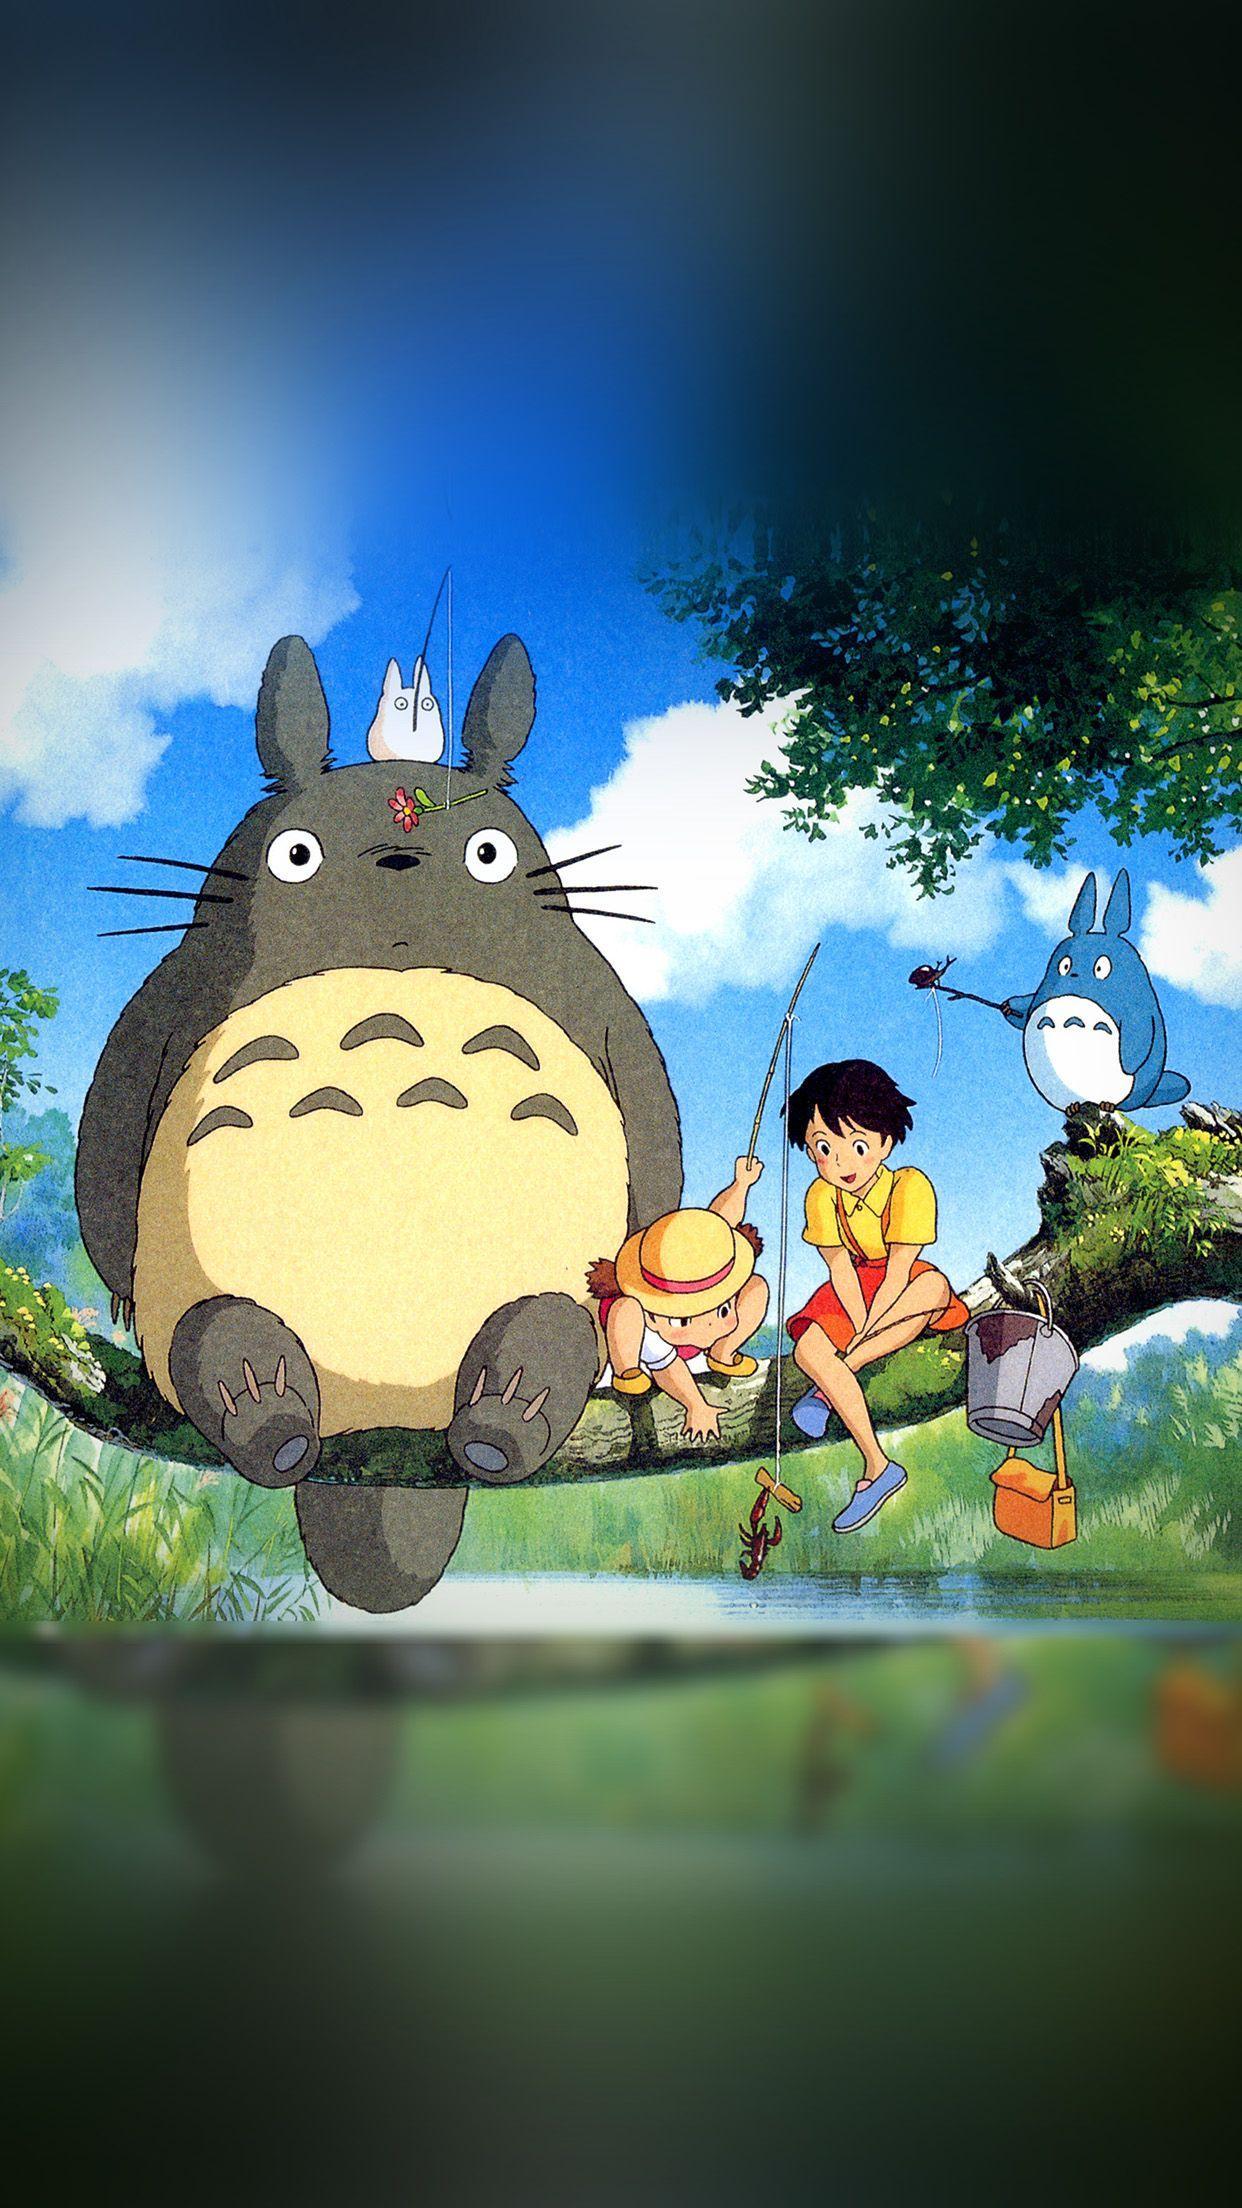 Totoro smartphone wallpapers top free totoro smartphone - Totoro wallpaper iphone ...